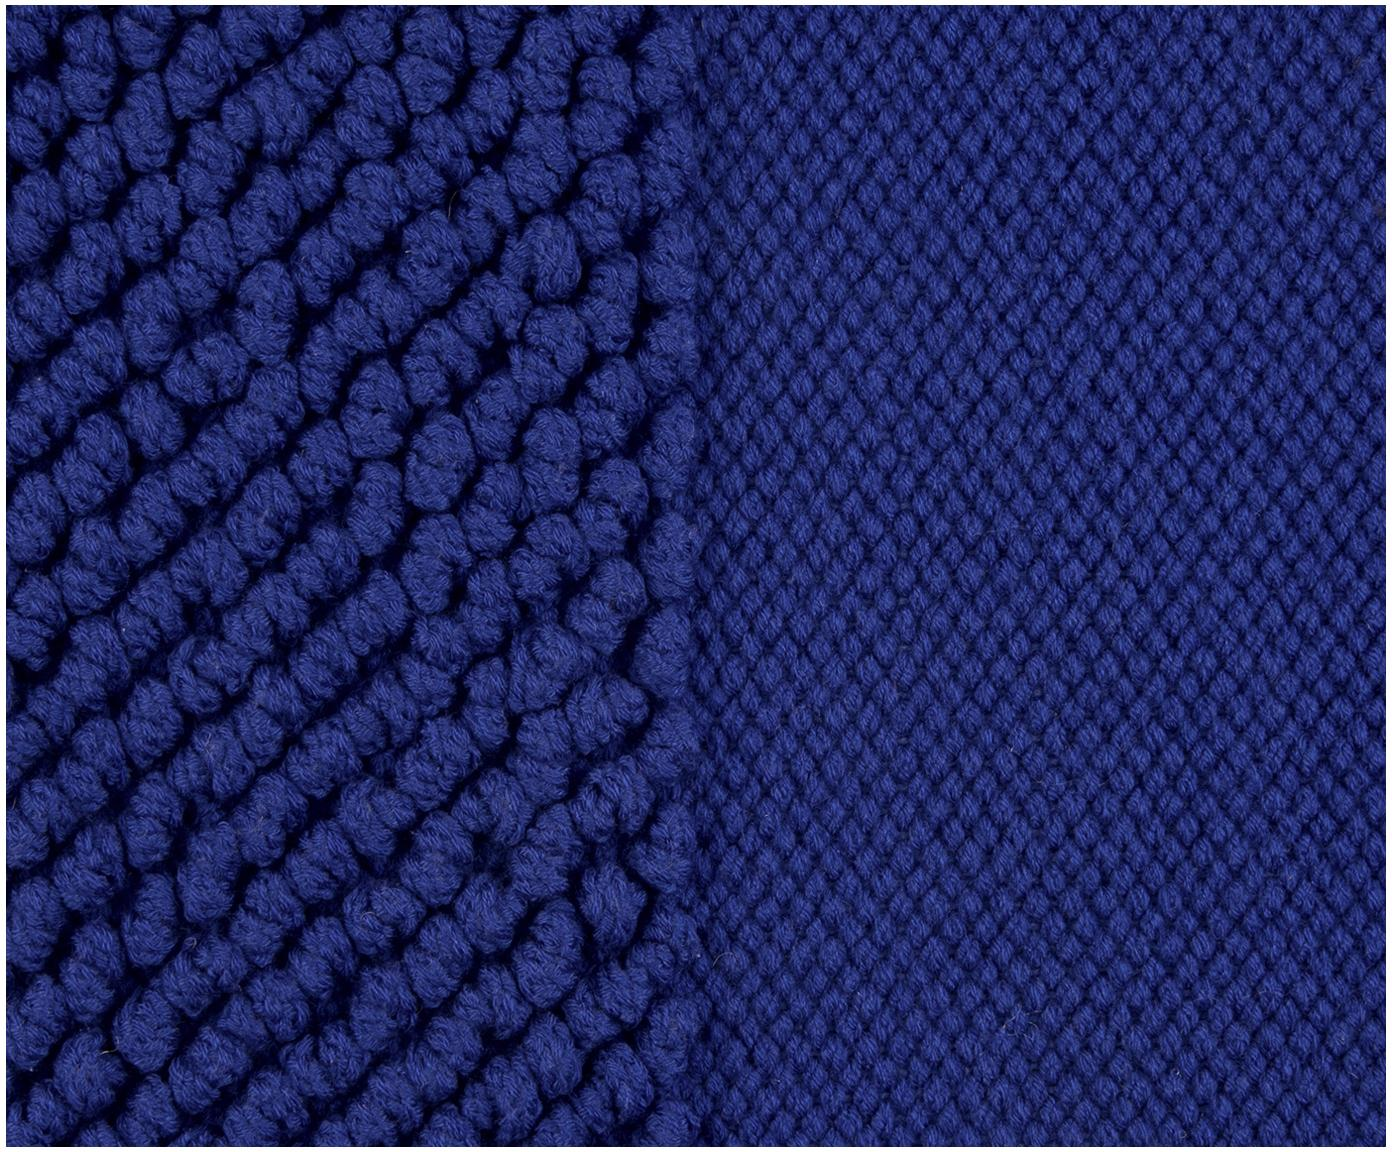 Kussenhoes Andi, 90% acryl, 10% katoen, Blauw, 40 x 40 cm